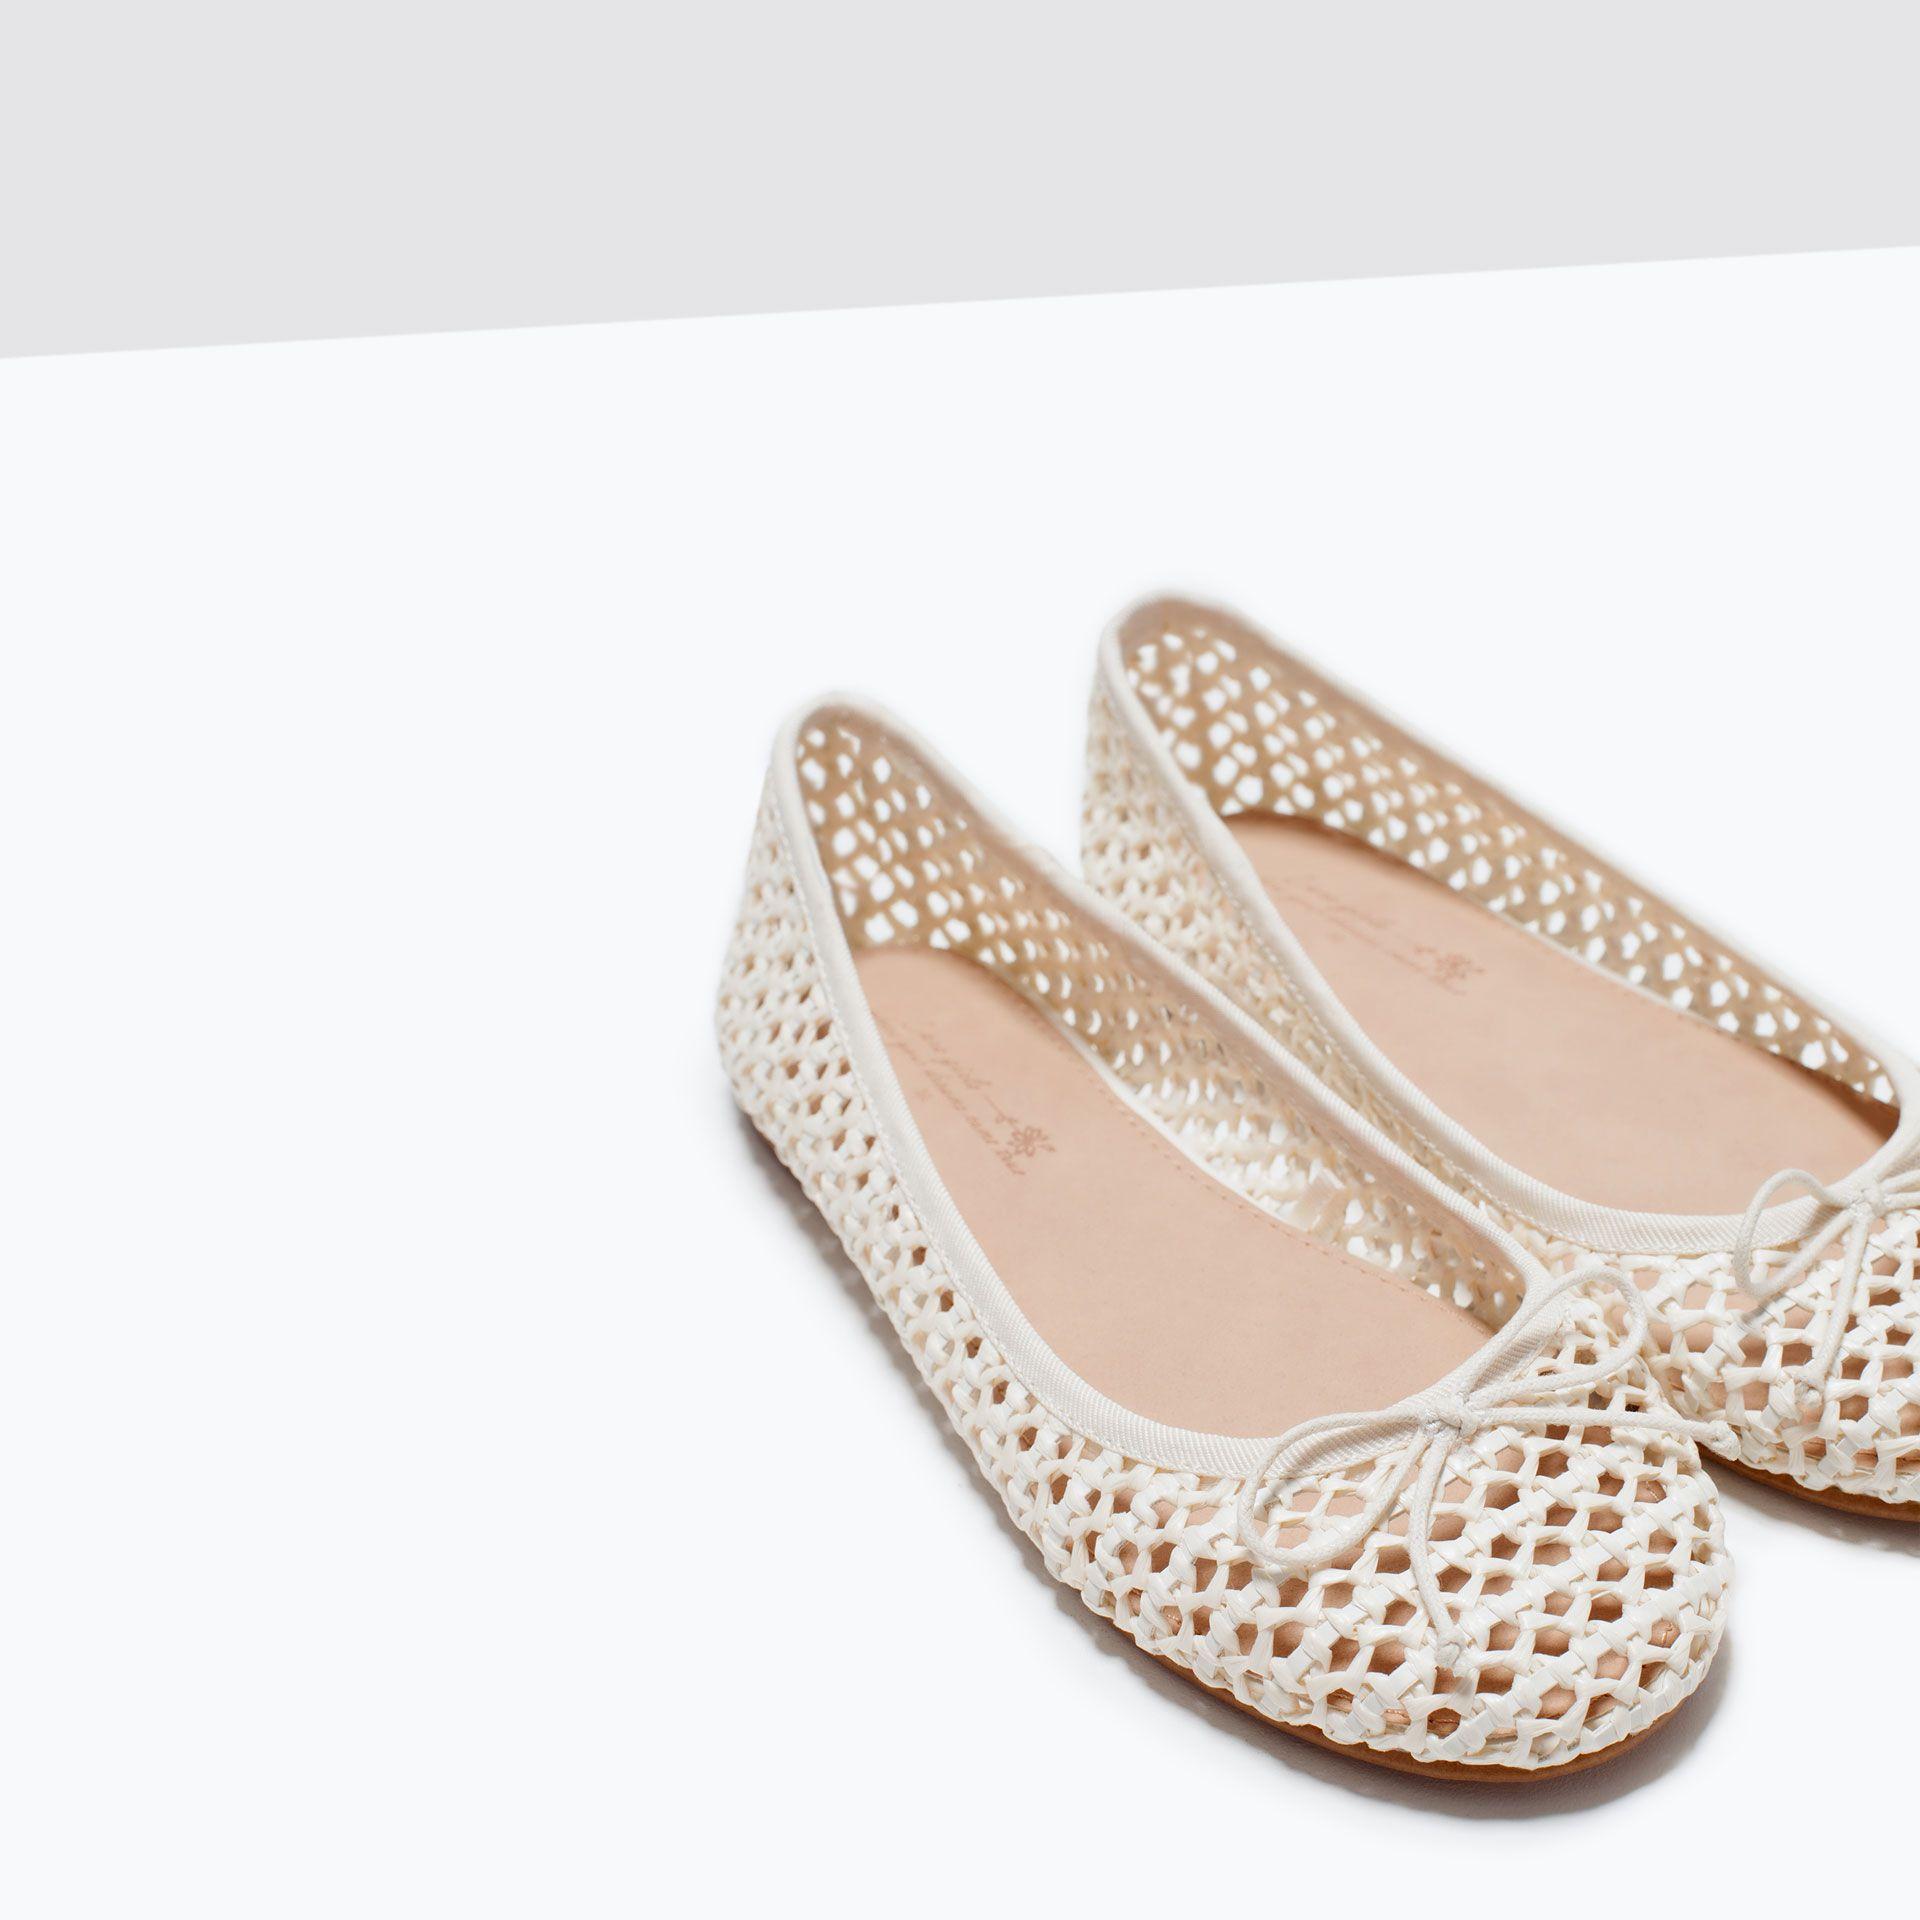 Azurowe Balerinki Buty Dziewczynka 3 14 Lat Dzieci Ballerina Shoes Flats Ballerina Flats Girls Shoes